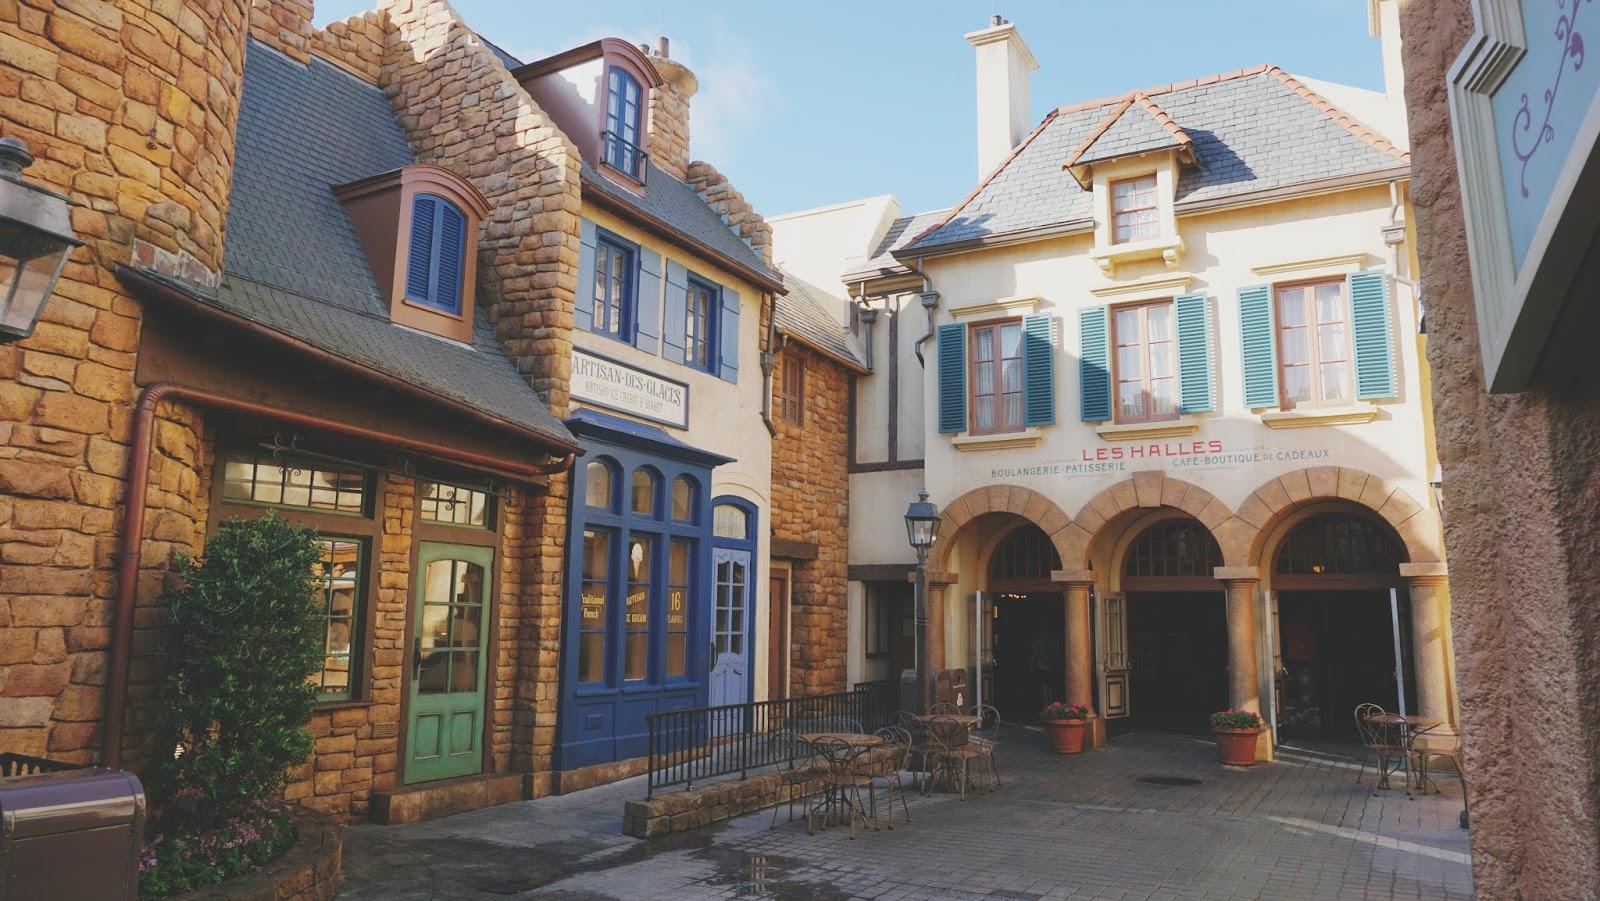 Paris in EPCOT, in Disney World, Florida